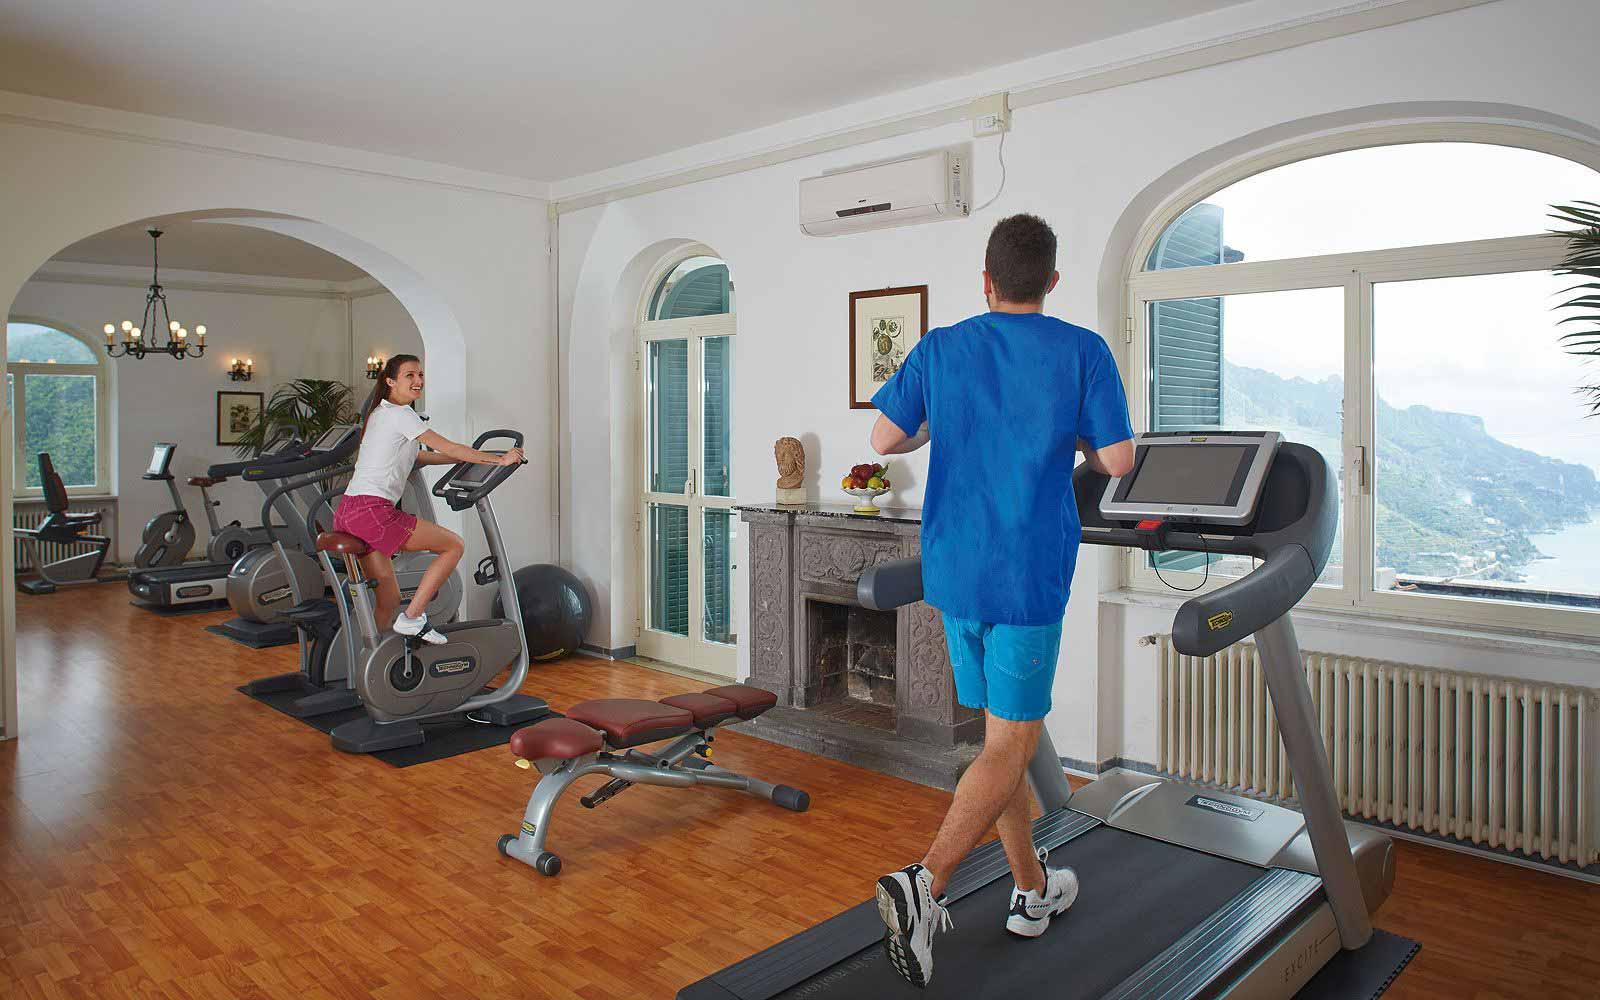 Gym at Belmond Hotel Caruso